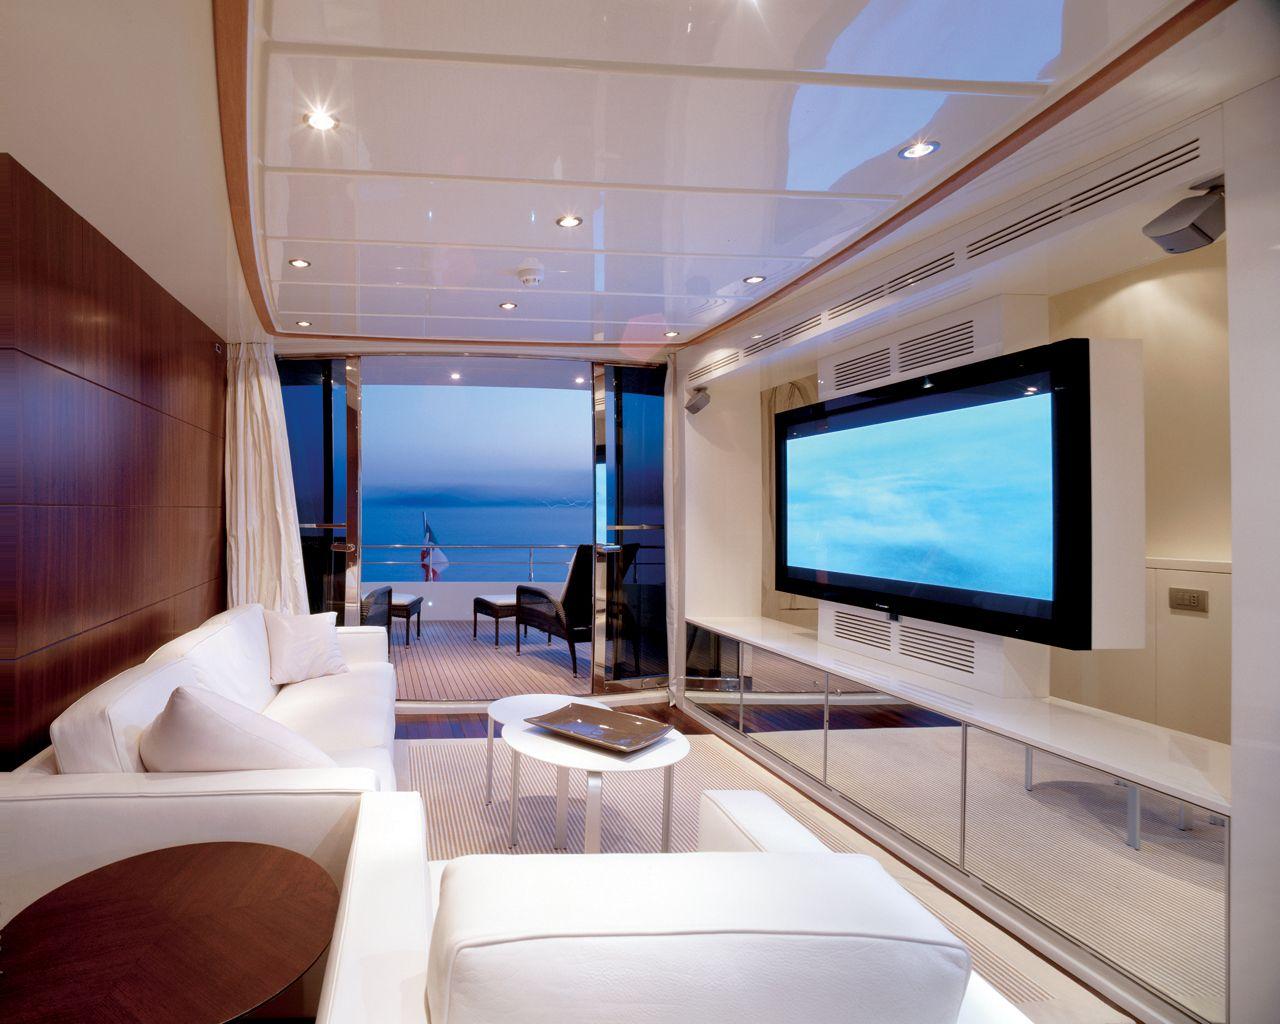 yacht interior design idea | YACHTS | Pinterest | Interiors and ...